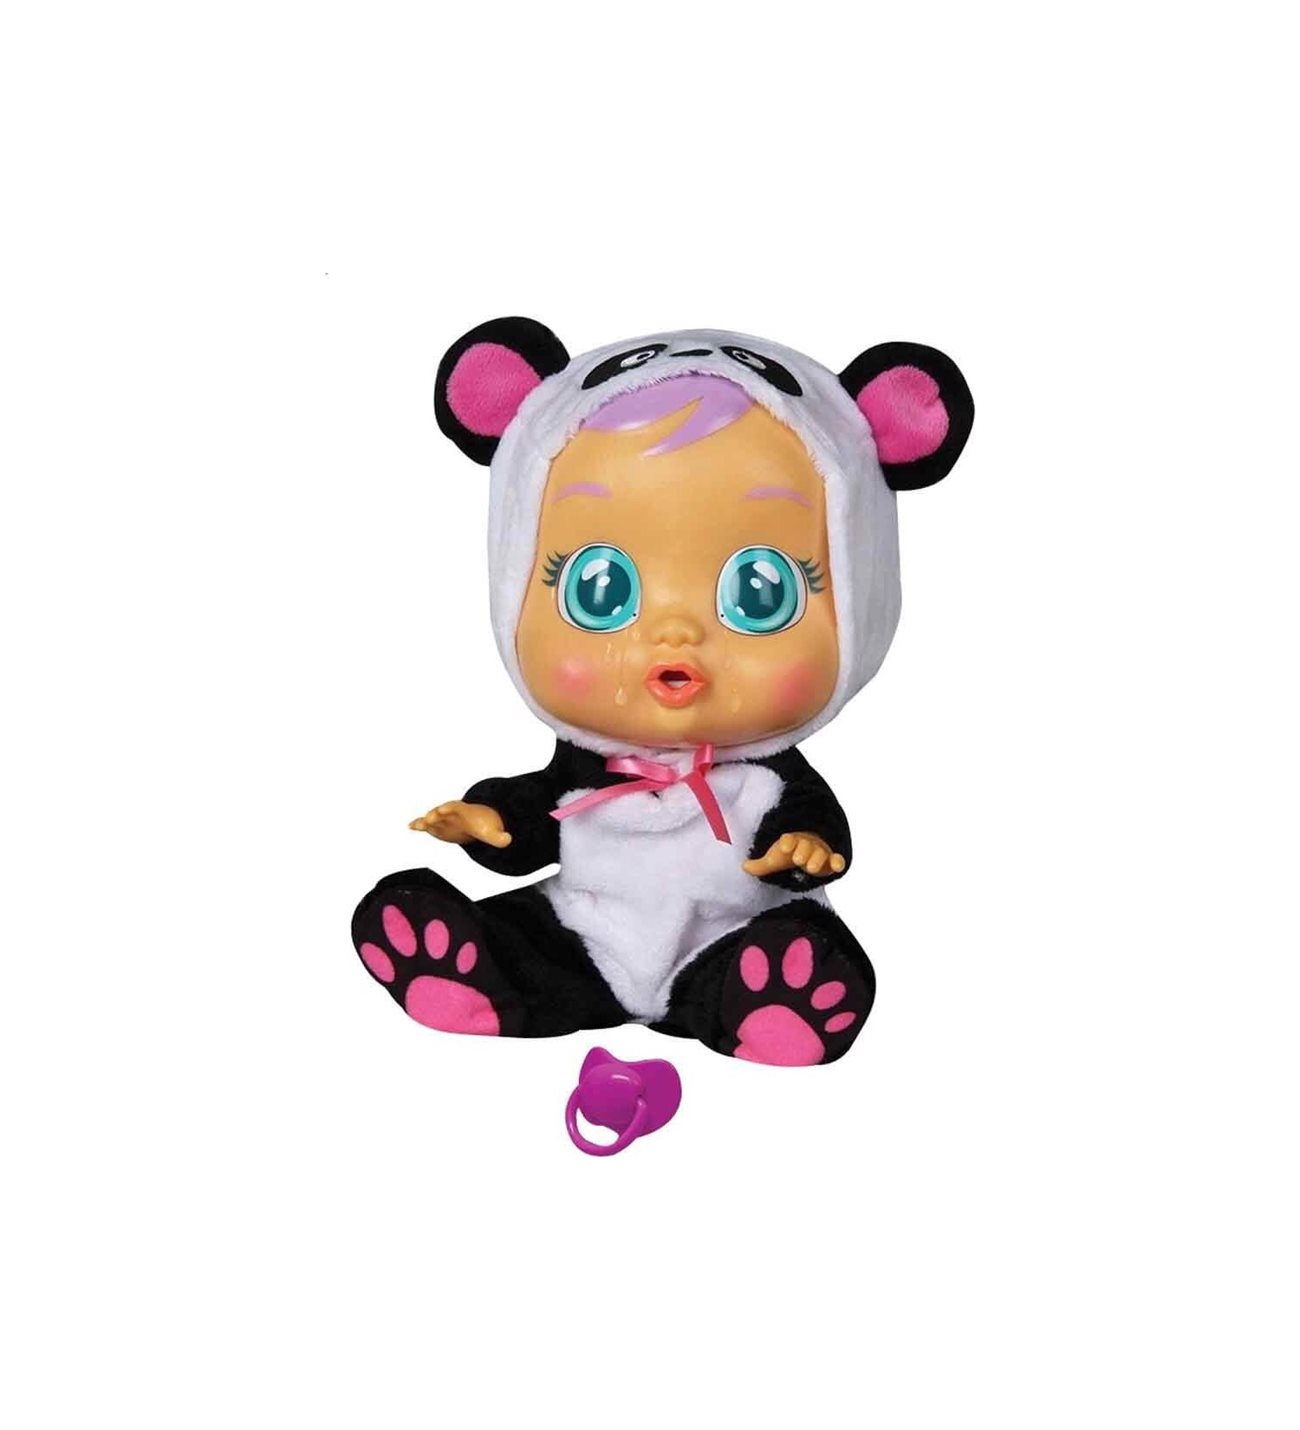 Boneca Cry Babies Pandy - Multikds